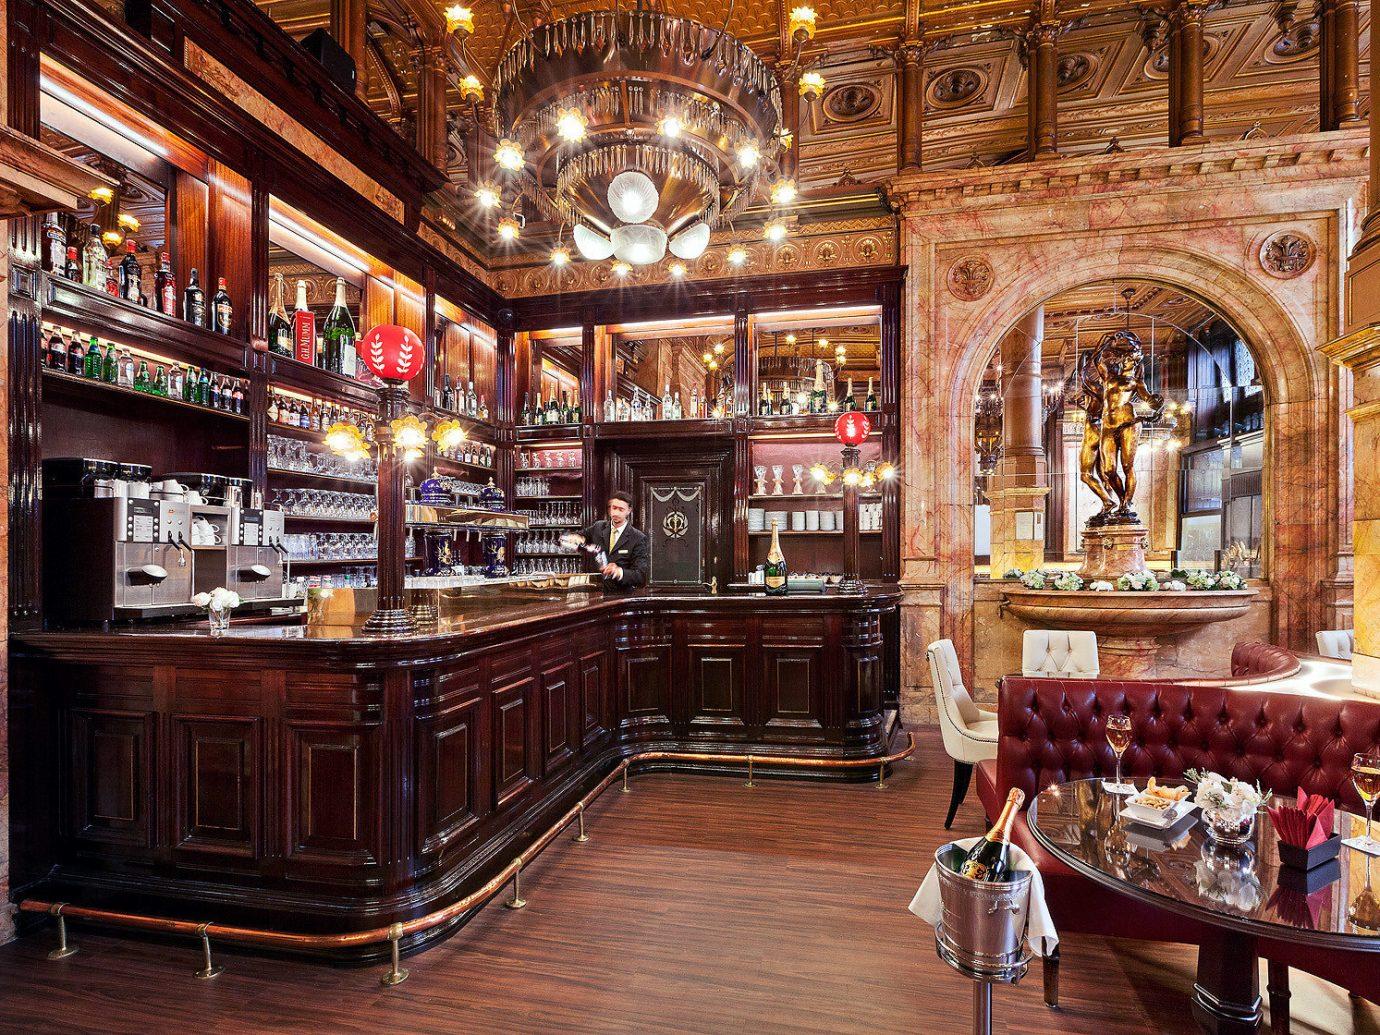 Food + Drink indoor floor building room Bar interior design estate